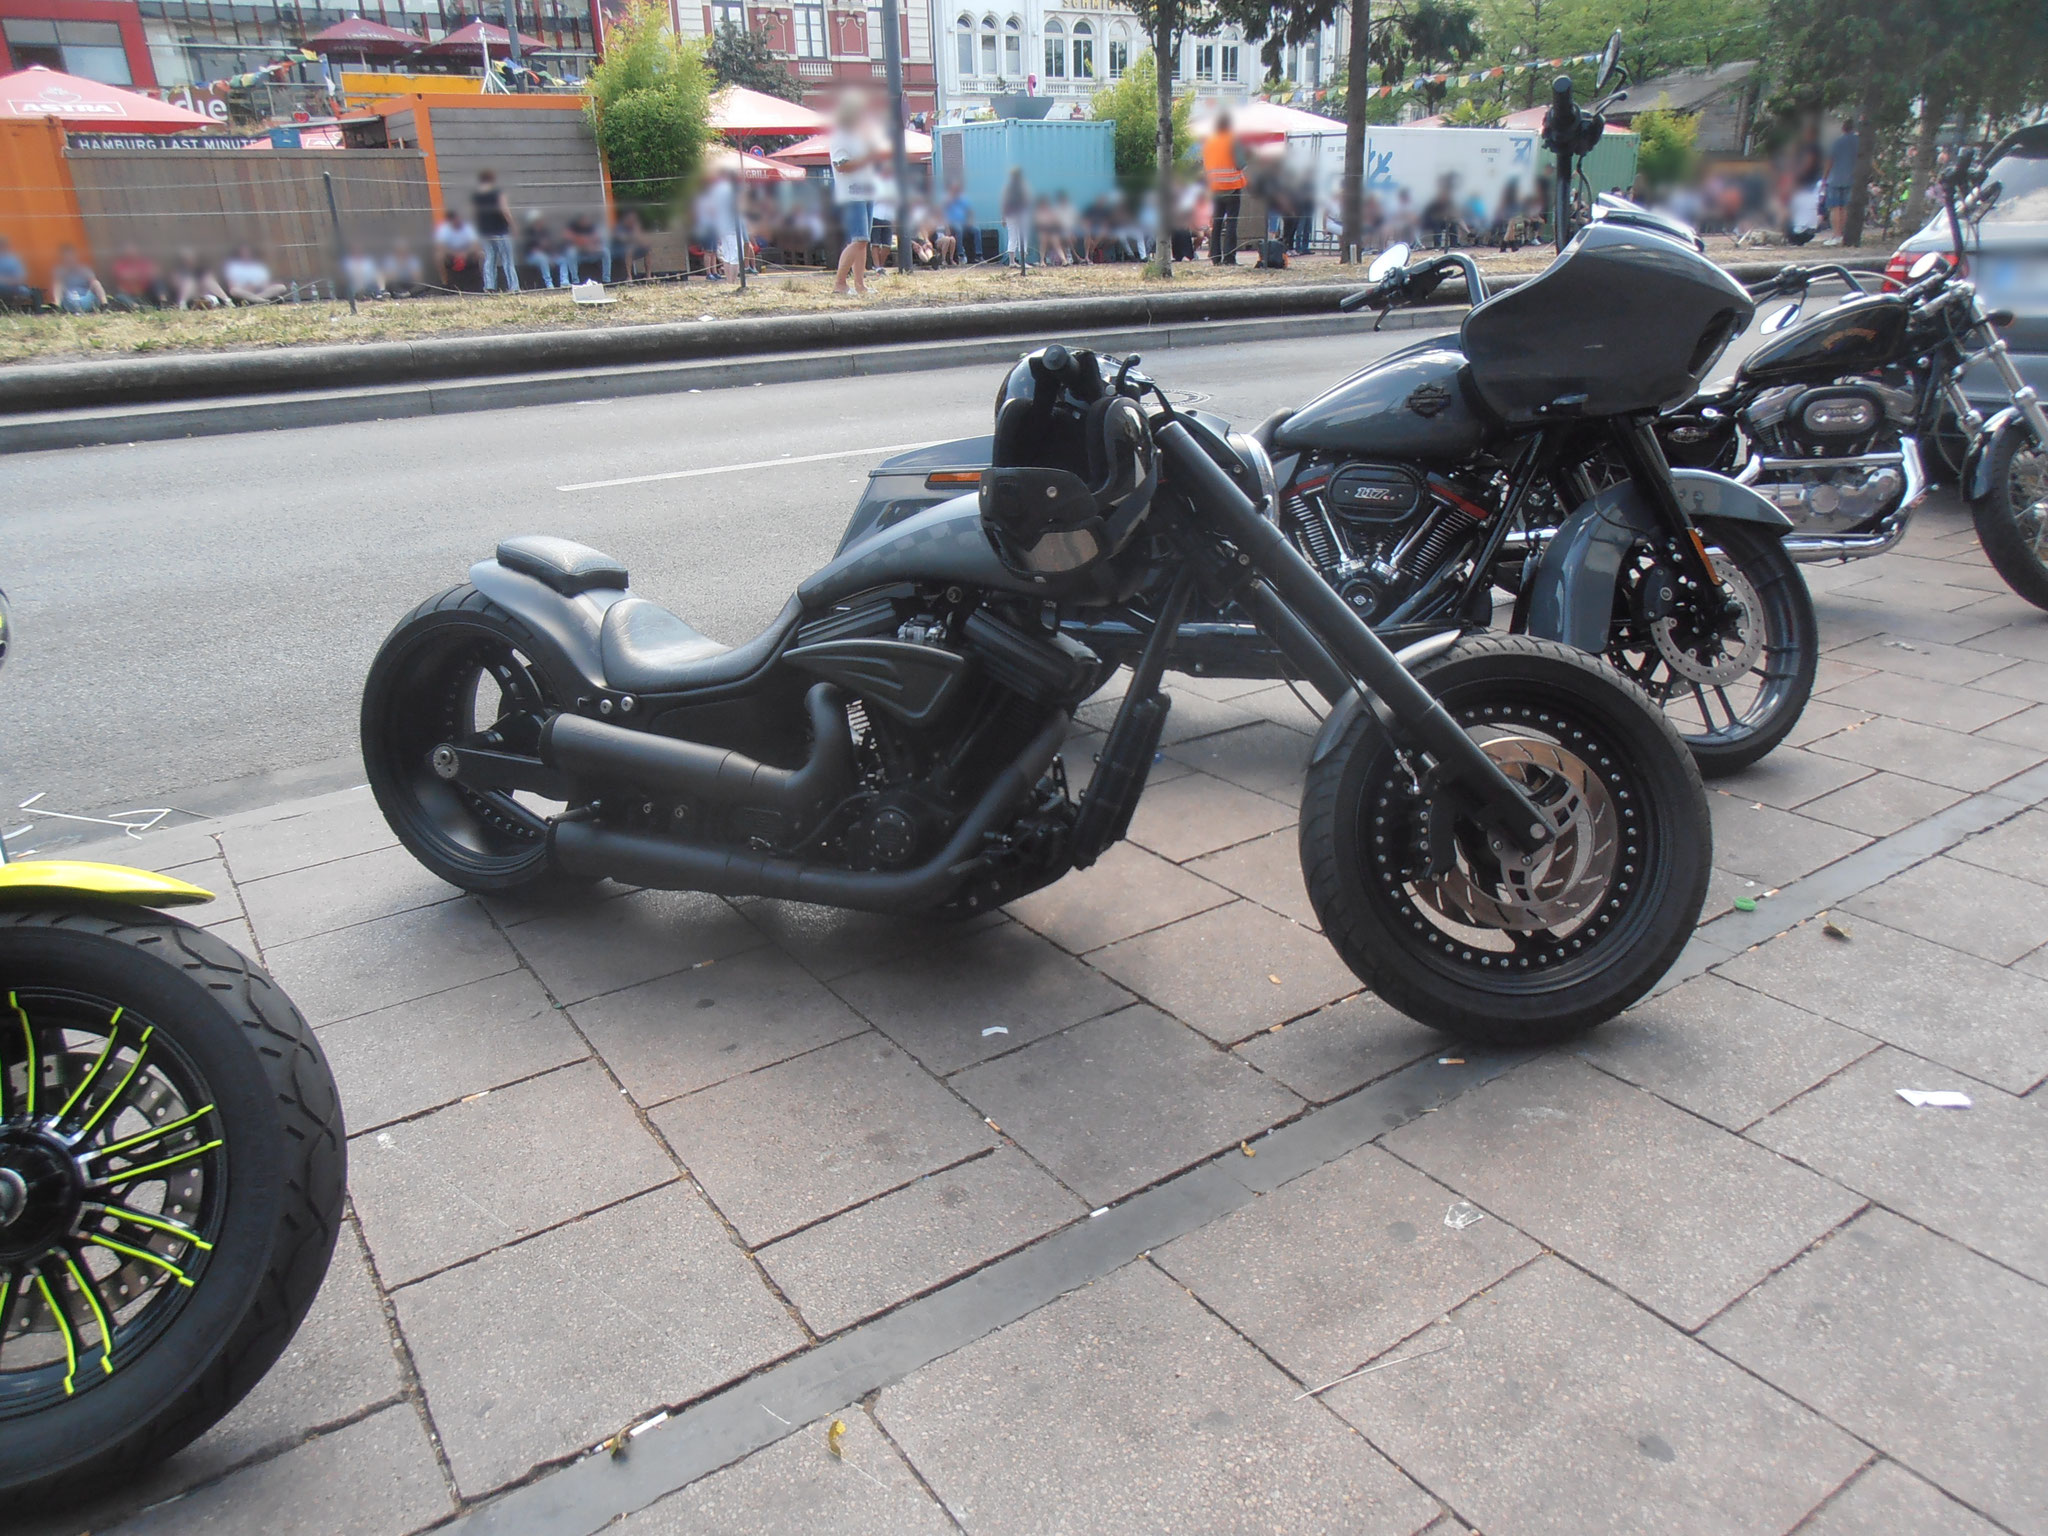 Impressionen Harley Days 2019 Hamburg St. Pauli